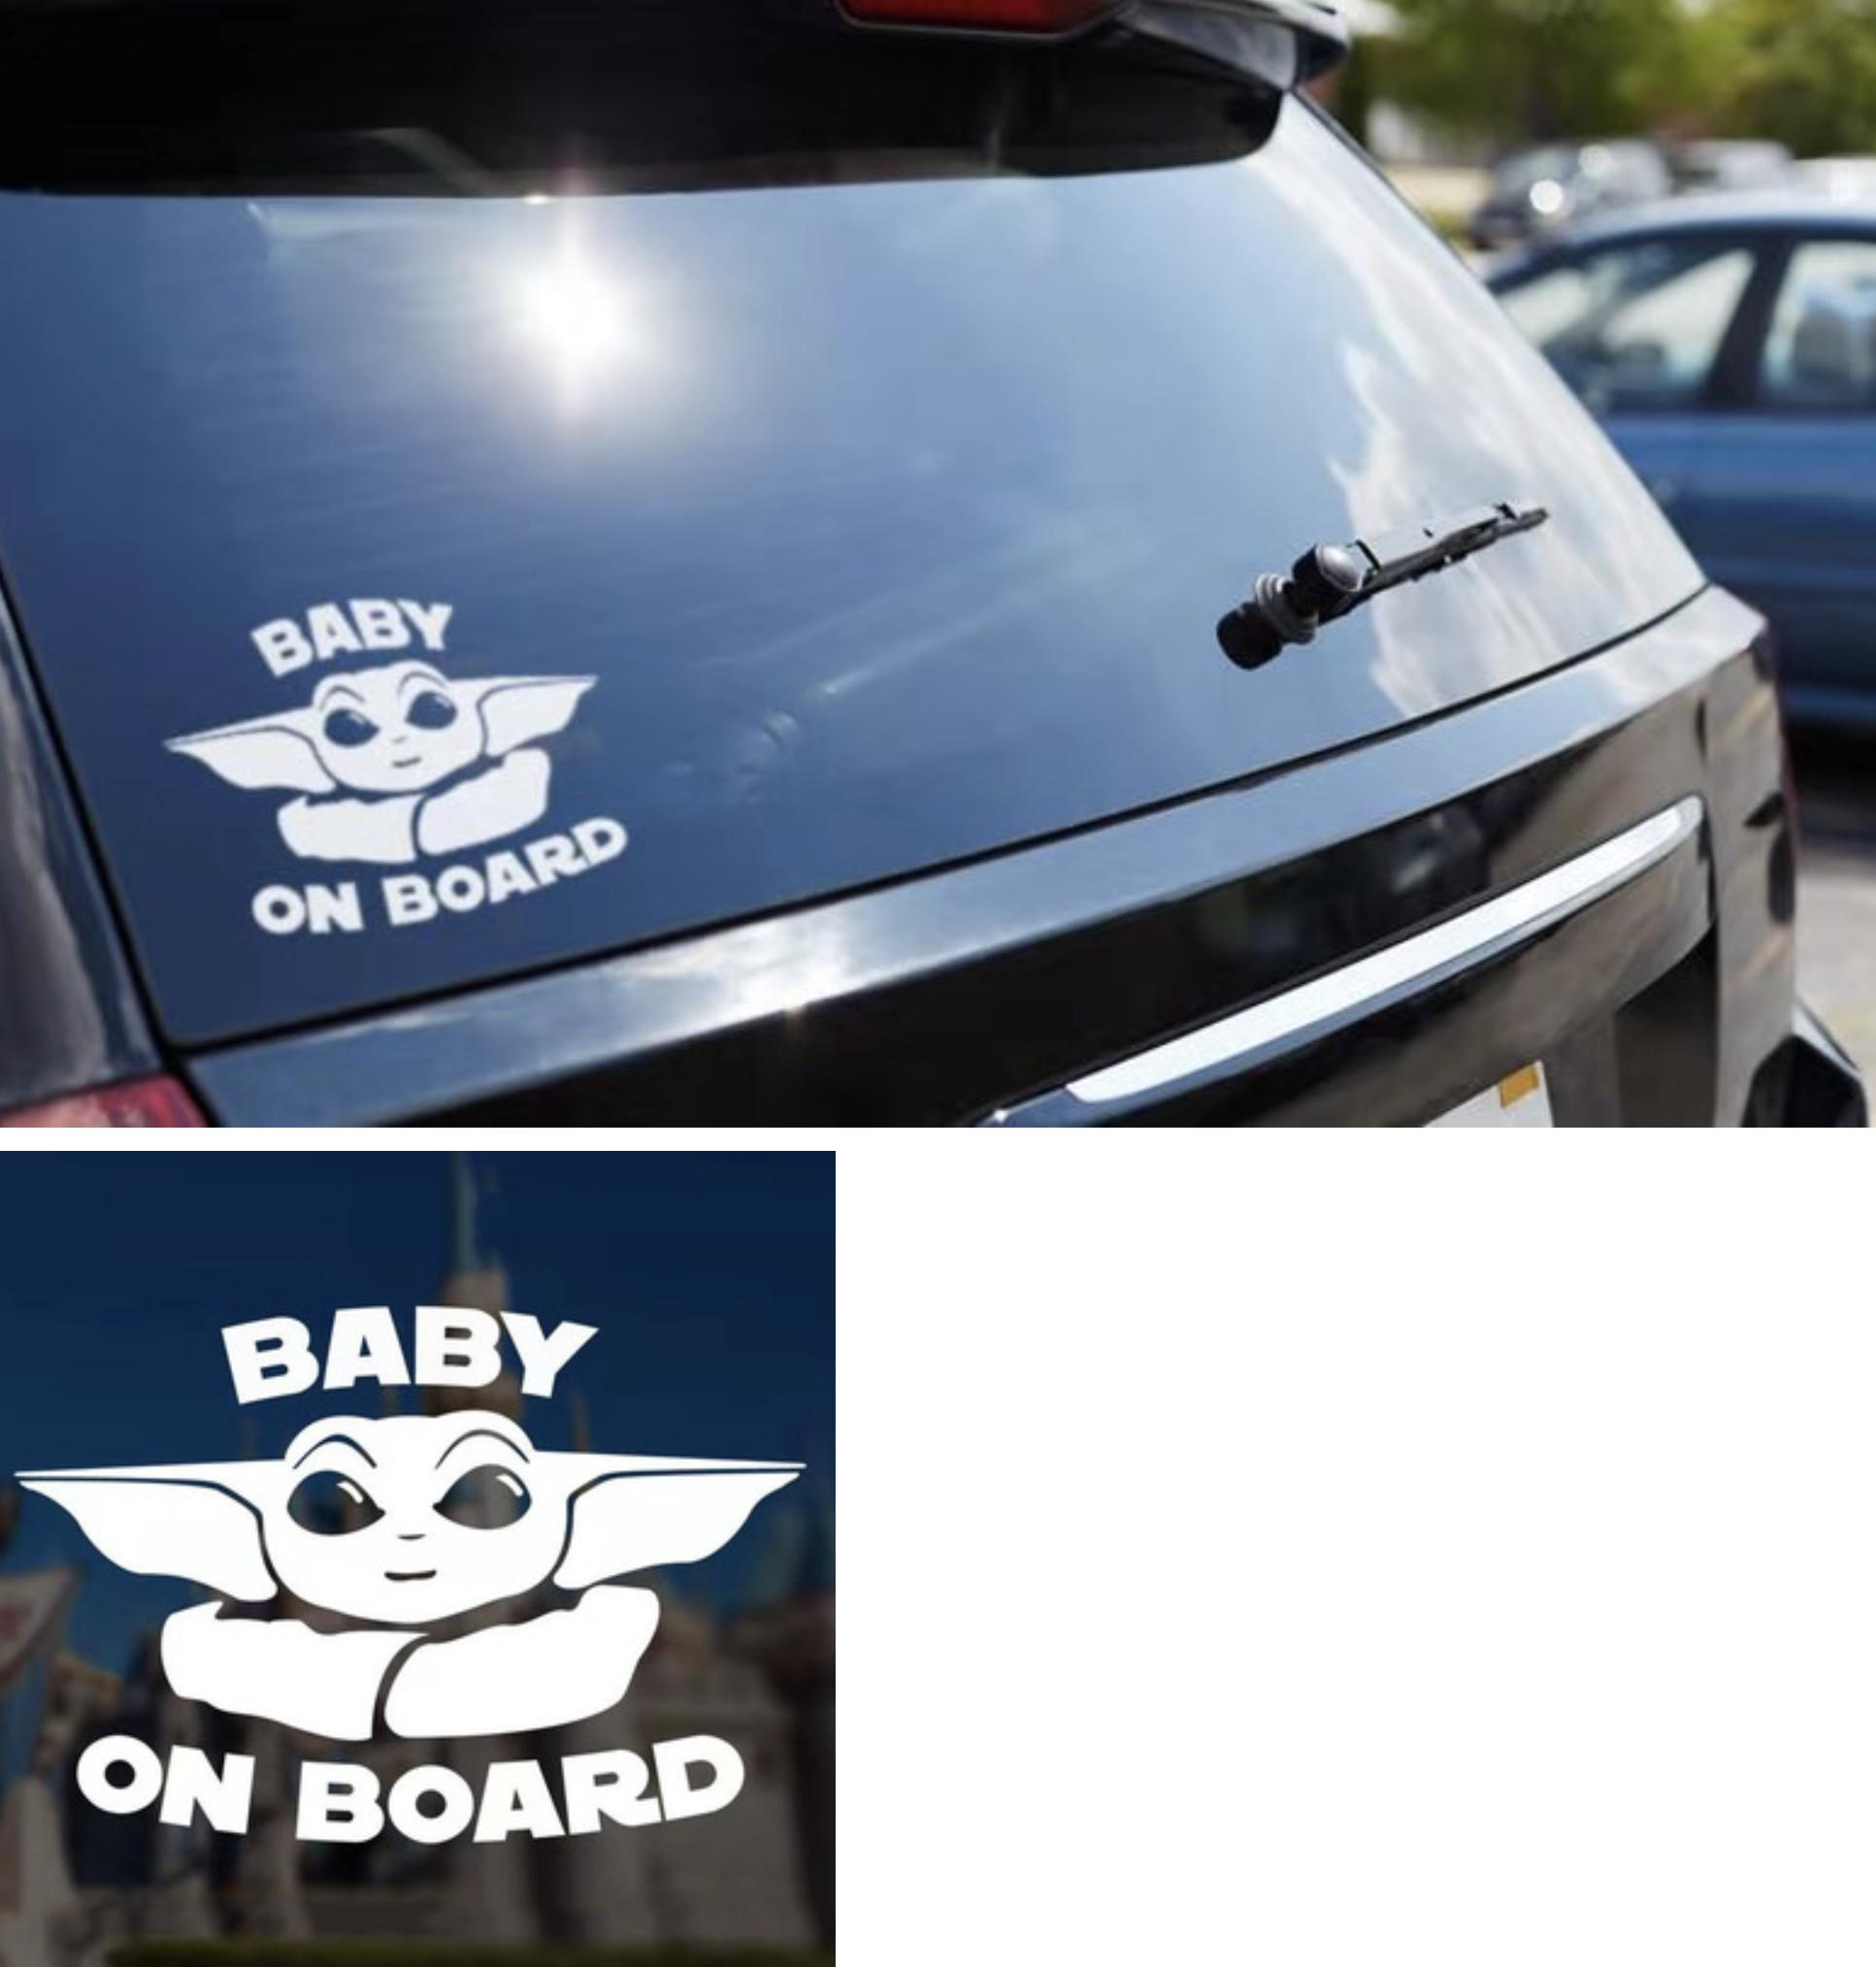 Baby Yoda On Board Car Stickers Decals Stickers Window Vinyl [ 2027 x 1933 Pixel ]